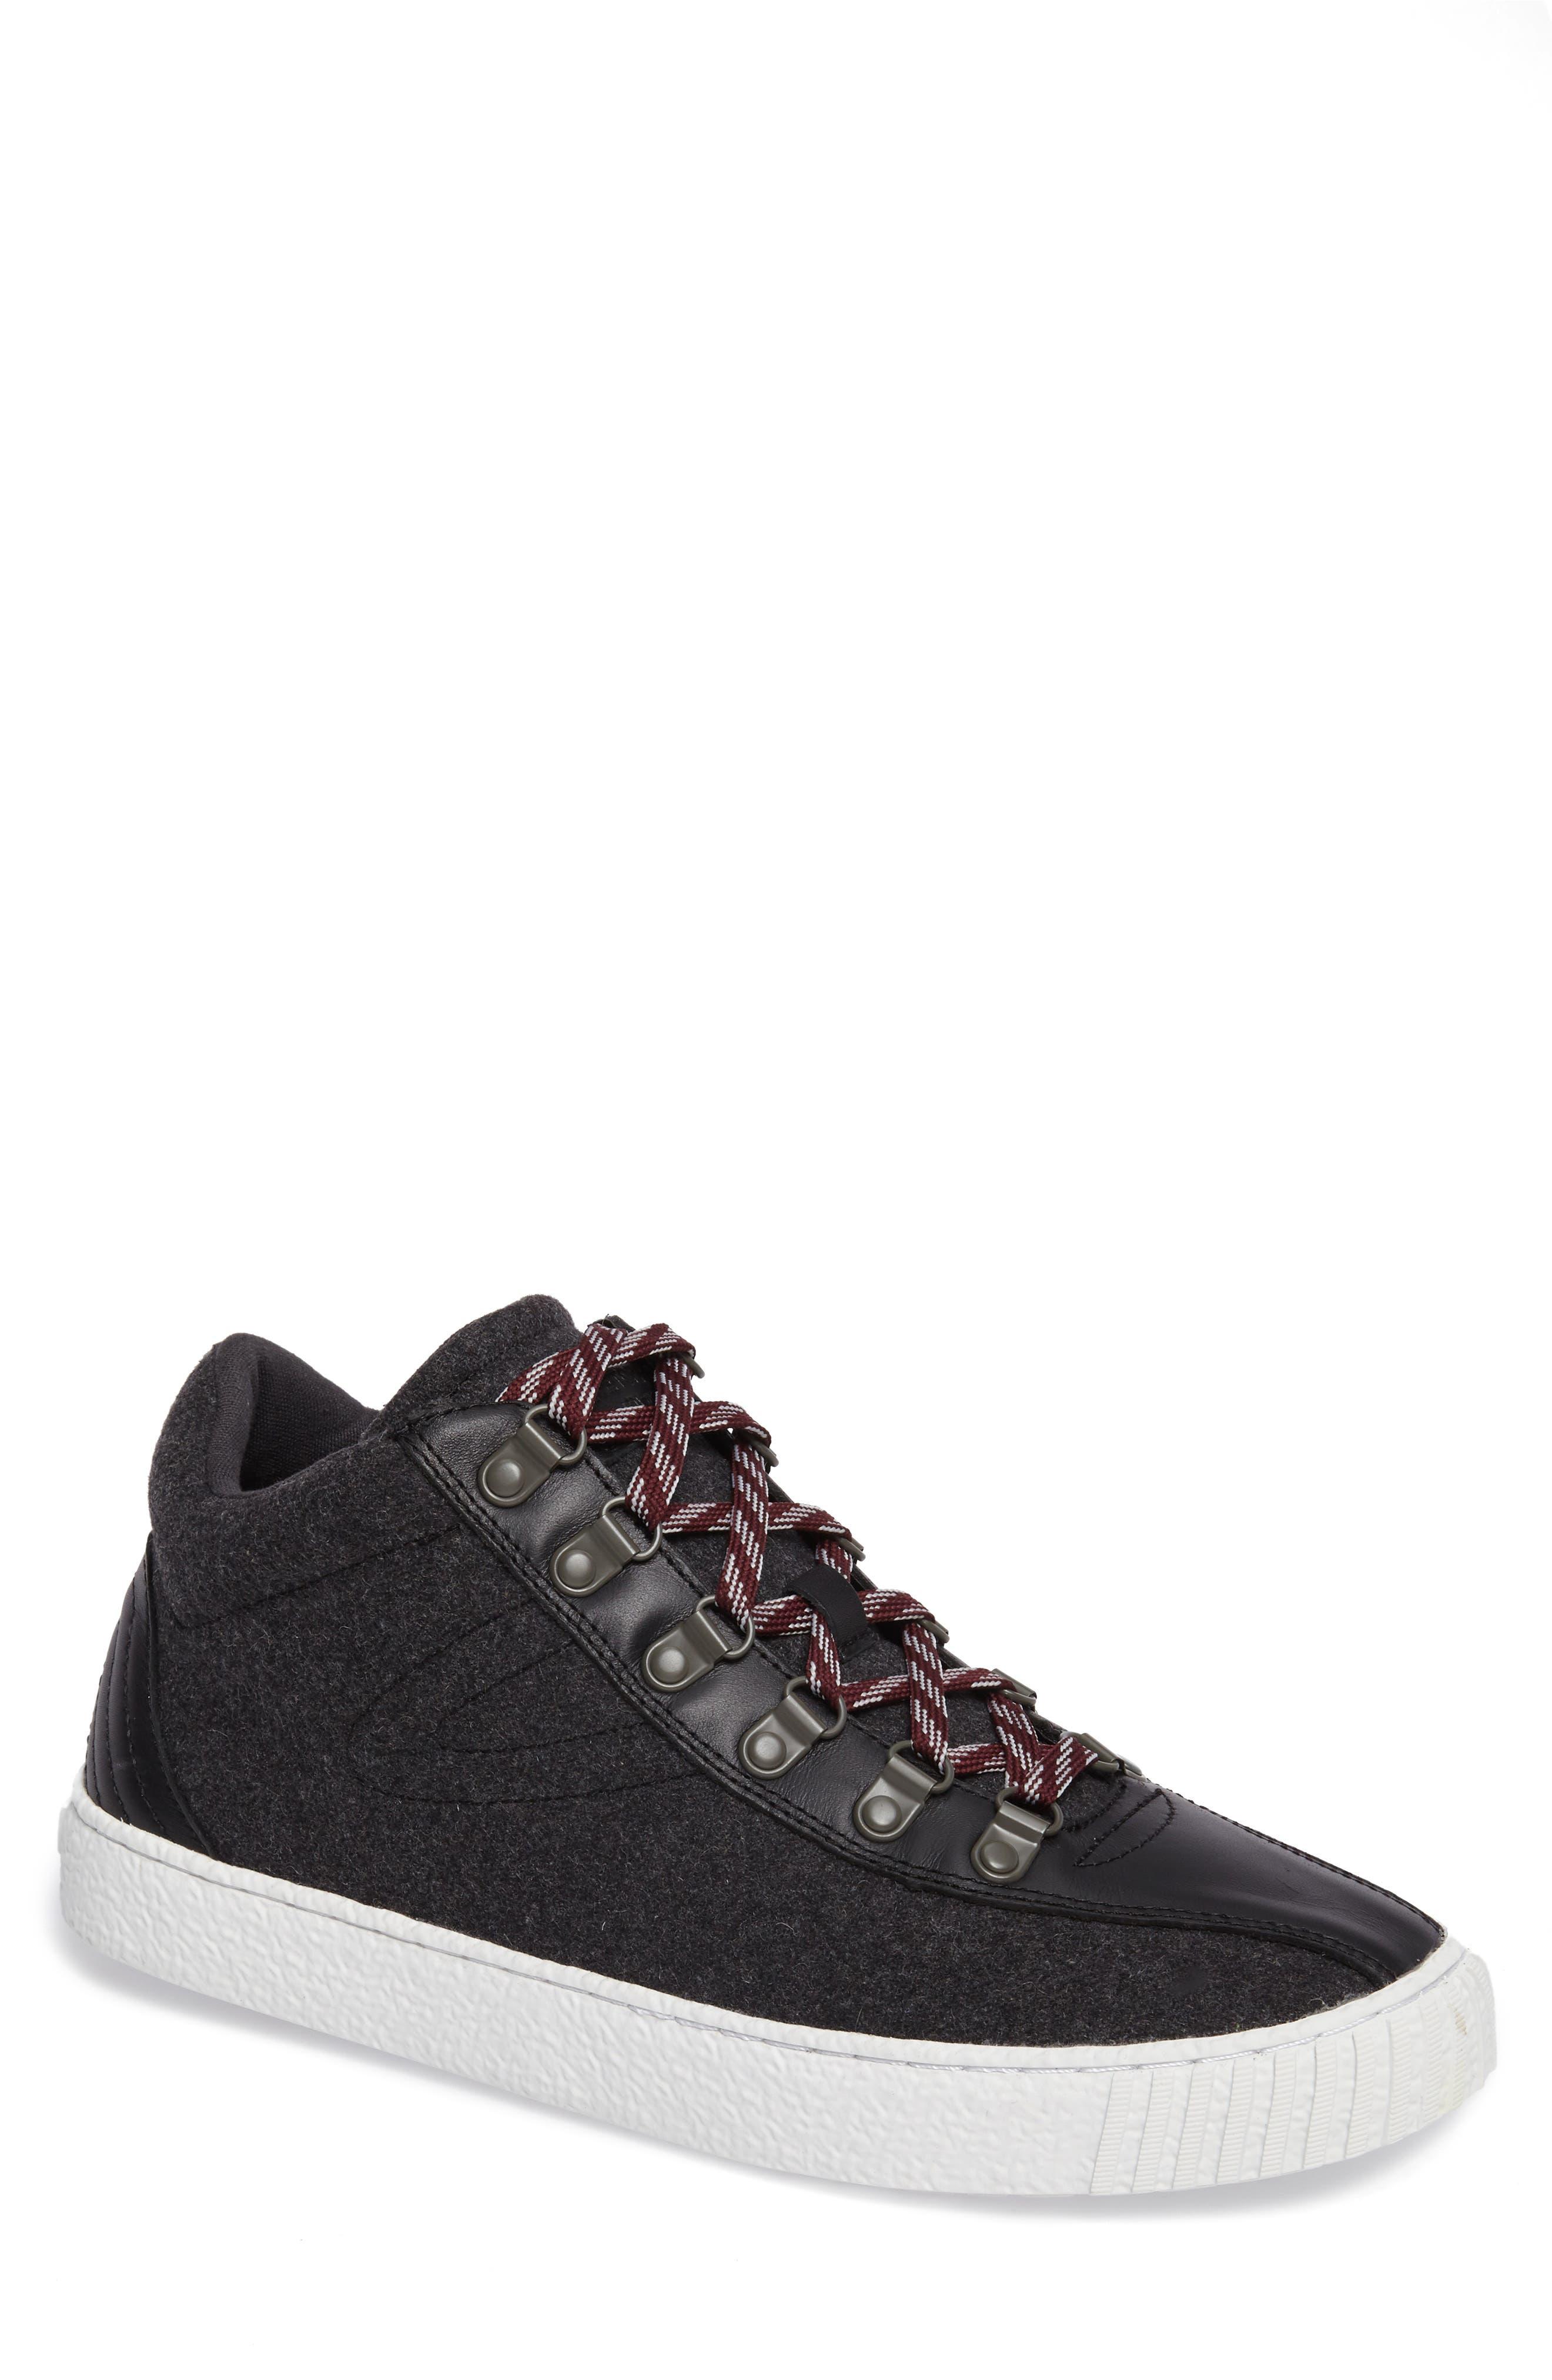 Dante Sneaker,                         Main,                         color, Dark Grey/ Black